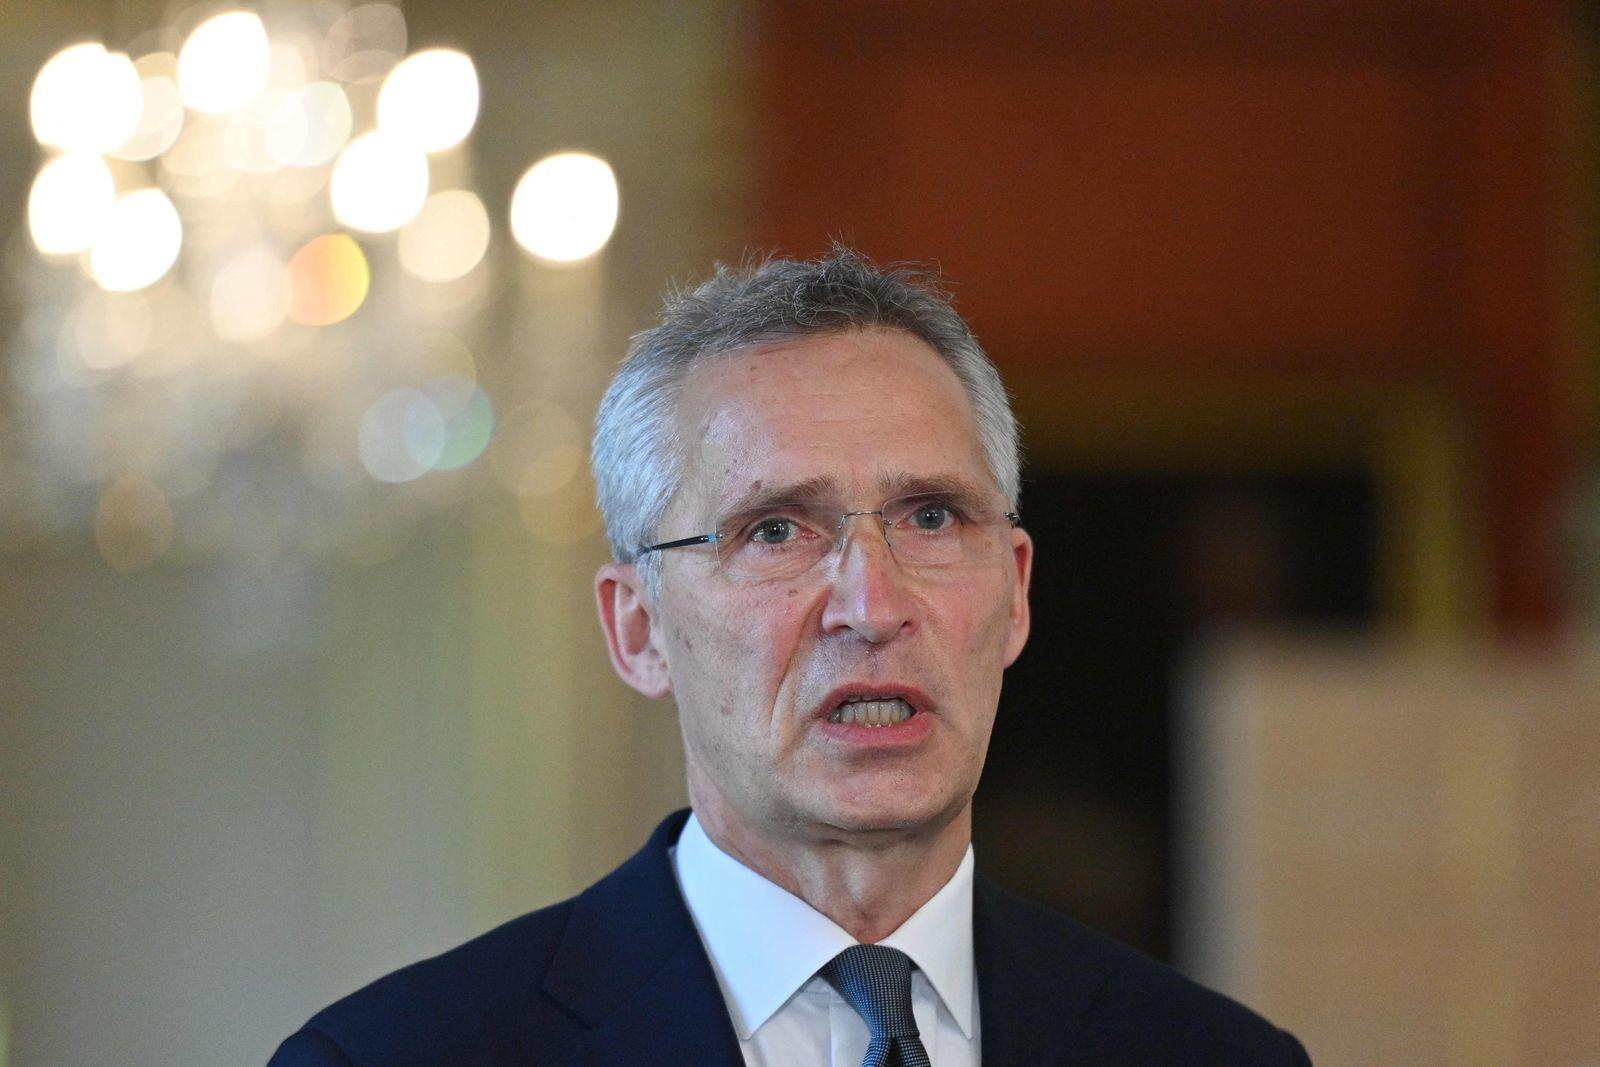 BRITAIN-POLITICS-NATO-DIPLOMACY